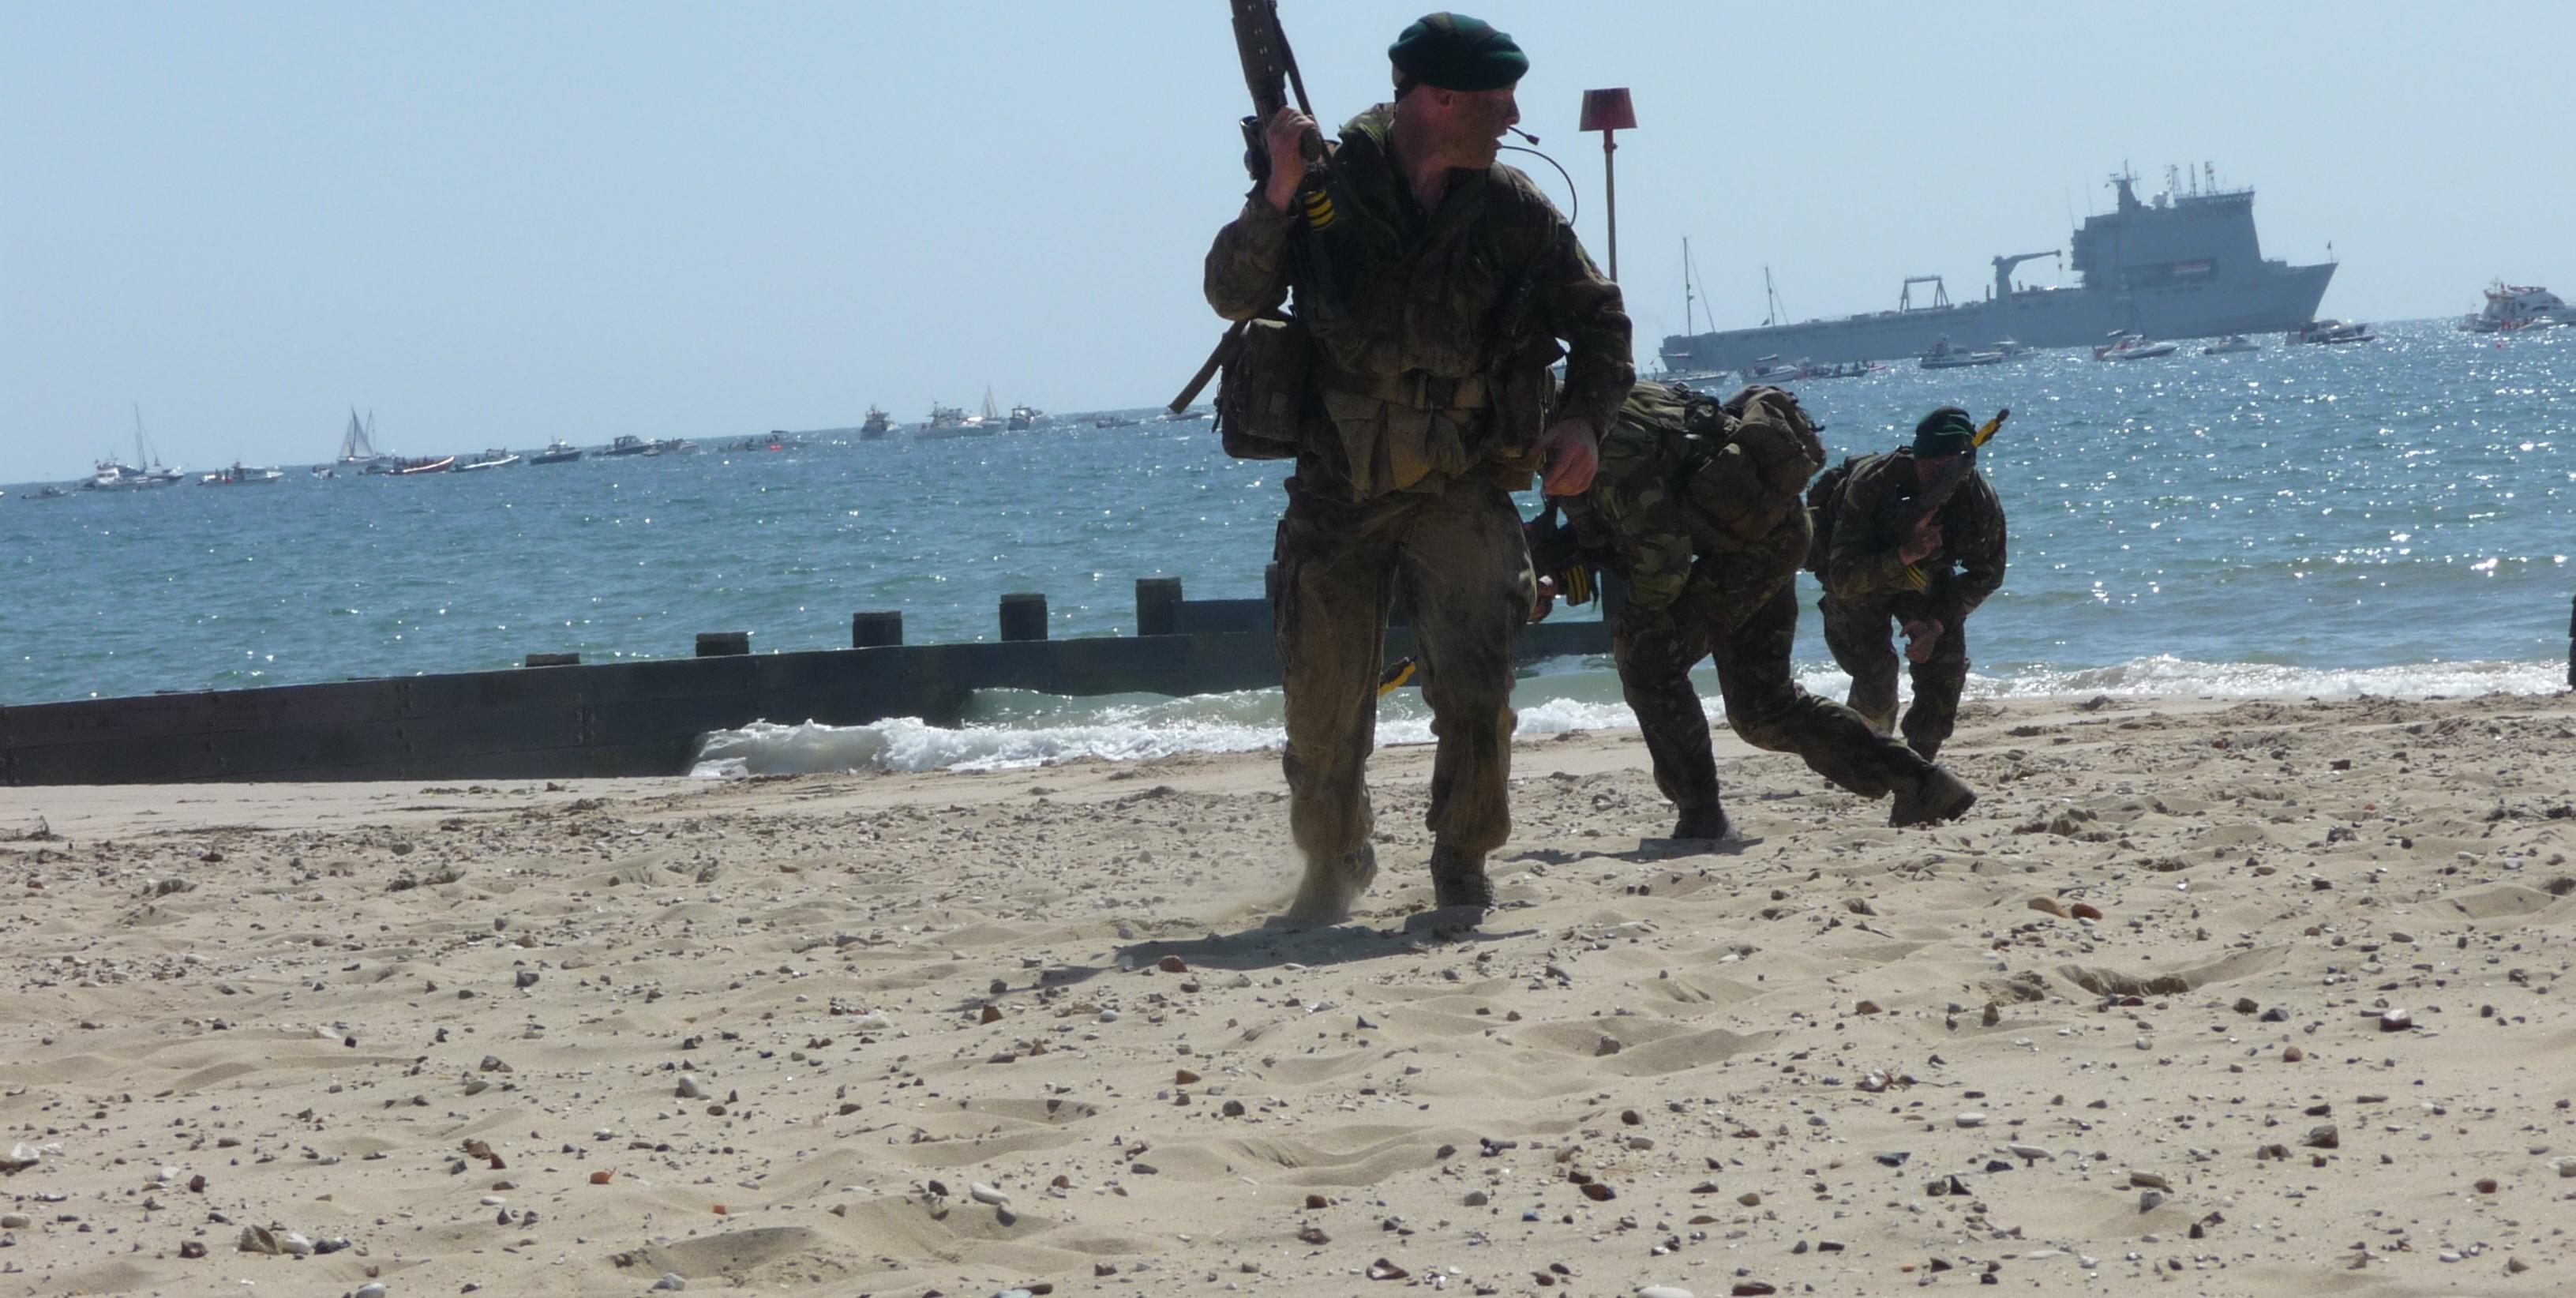 The Royal Marine Commando Display Team (Photo: Flickr/Damo1977)